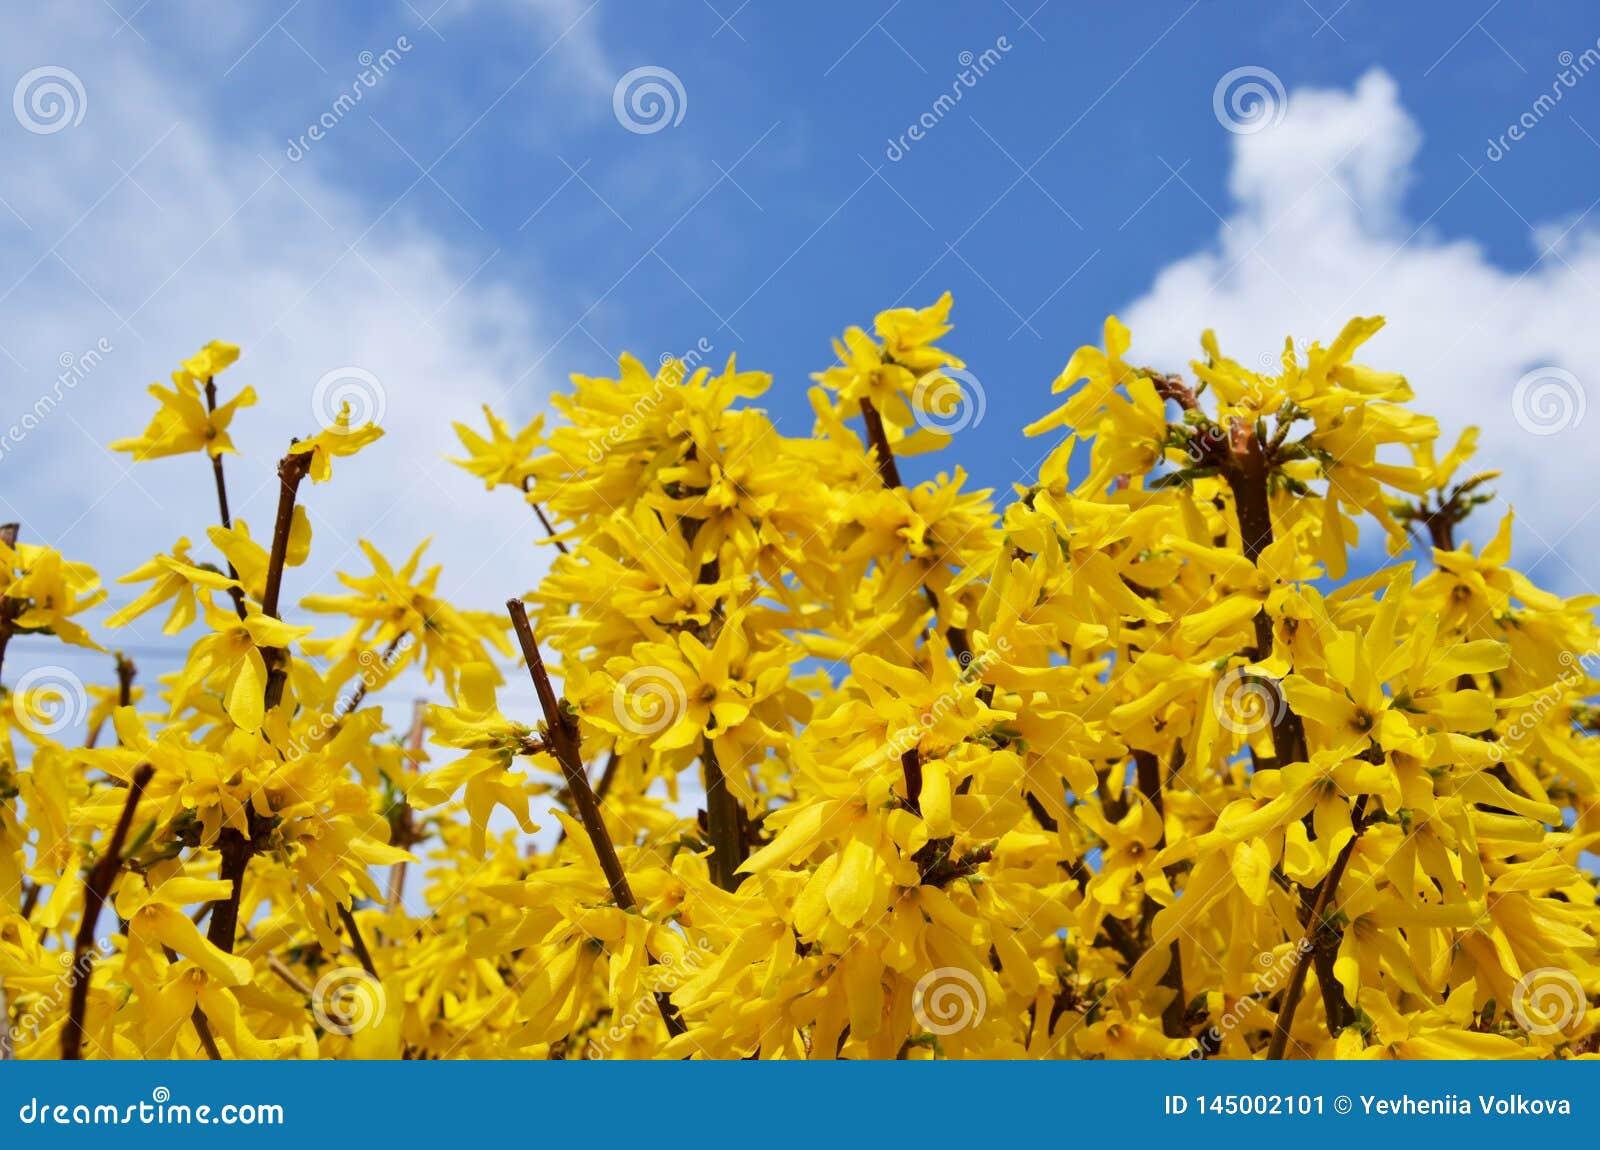 Spring Spring Yellow Forsythia Bushes Stock Image Image Of